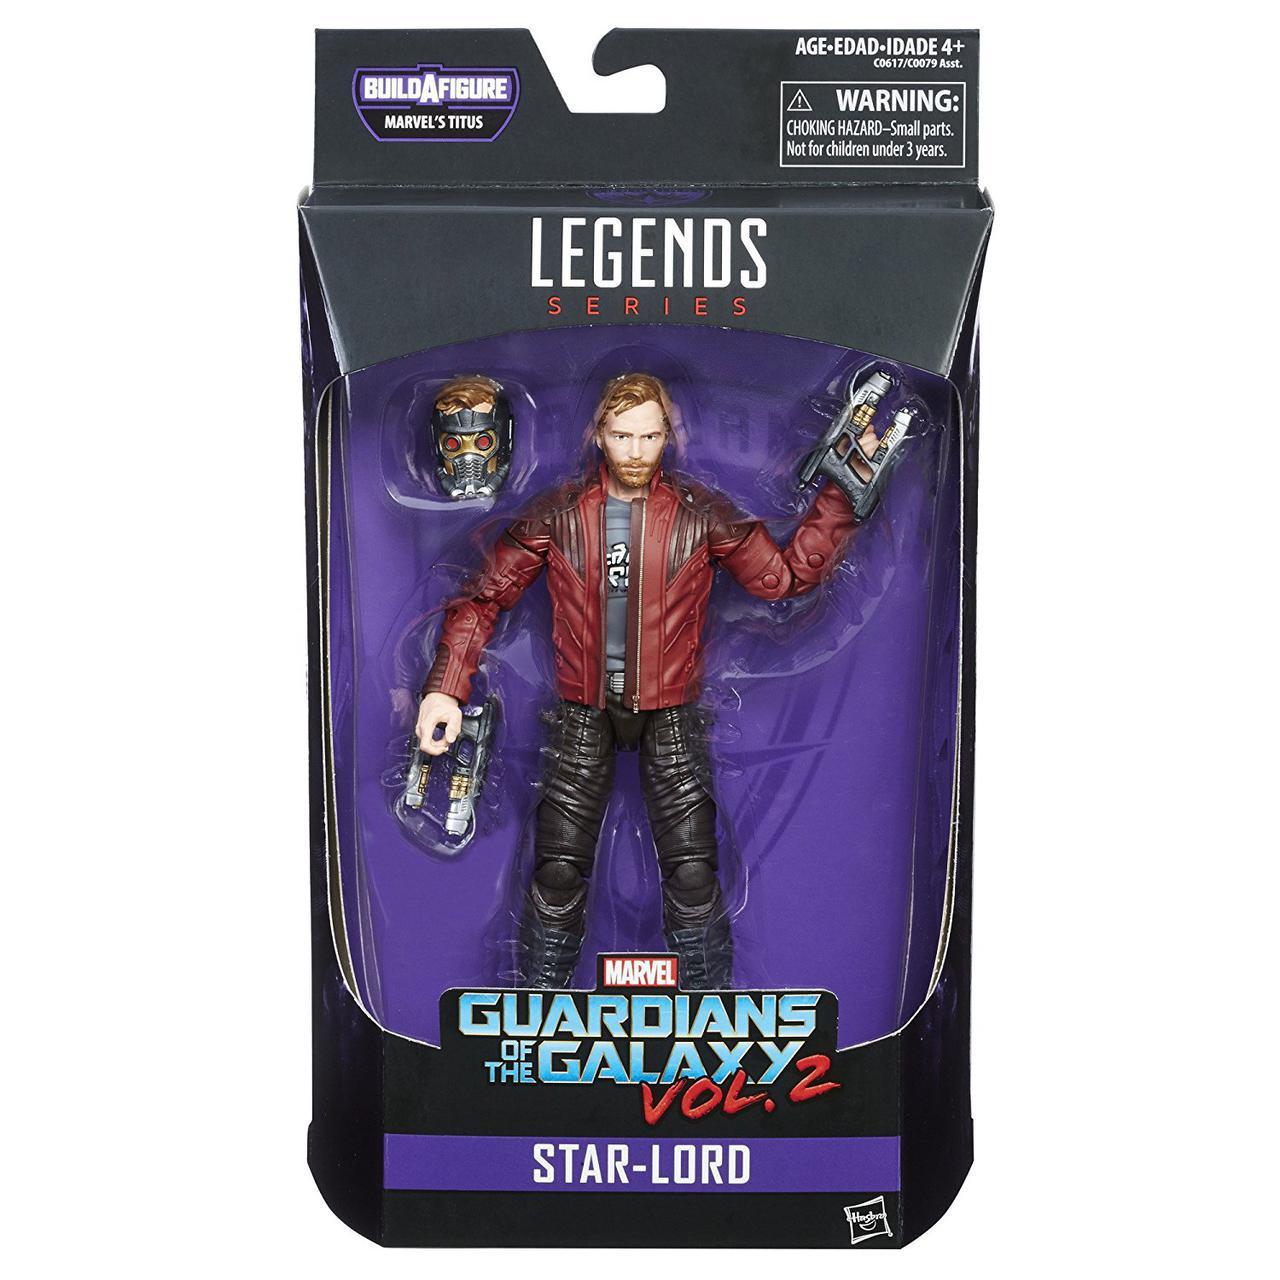 "Фигурка Звездного Лорда ""Стражи Галактики"", 15 см -Star-Lord, Galaxy Legends, Marvel's Titus, Hasbro"